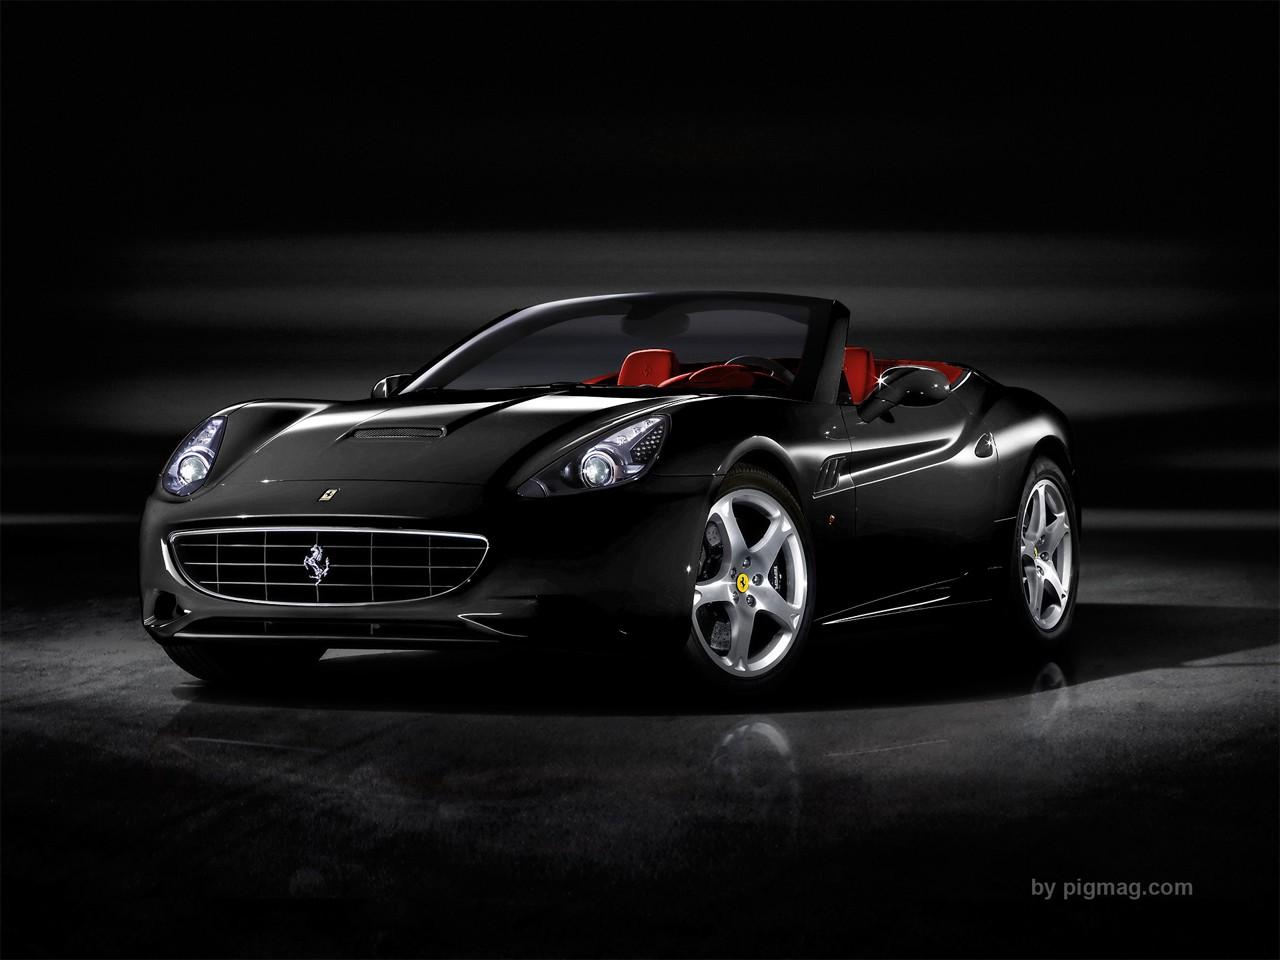 Silver And Black Ferrari Wallpaper 11 Cool Hd Wallpaper